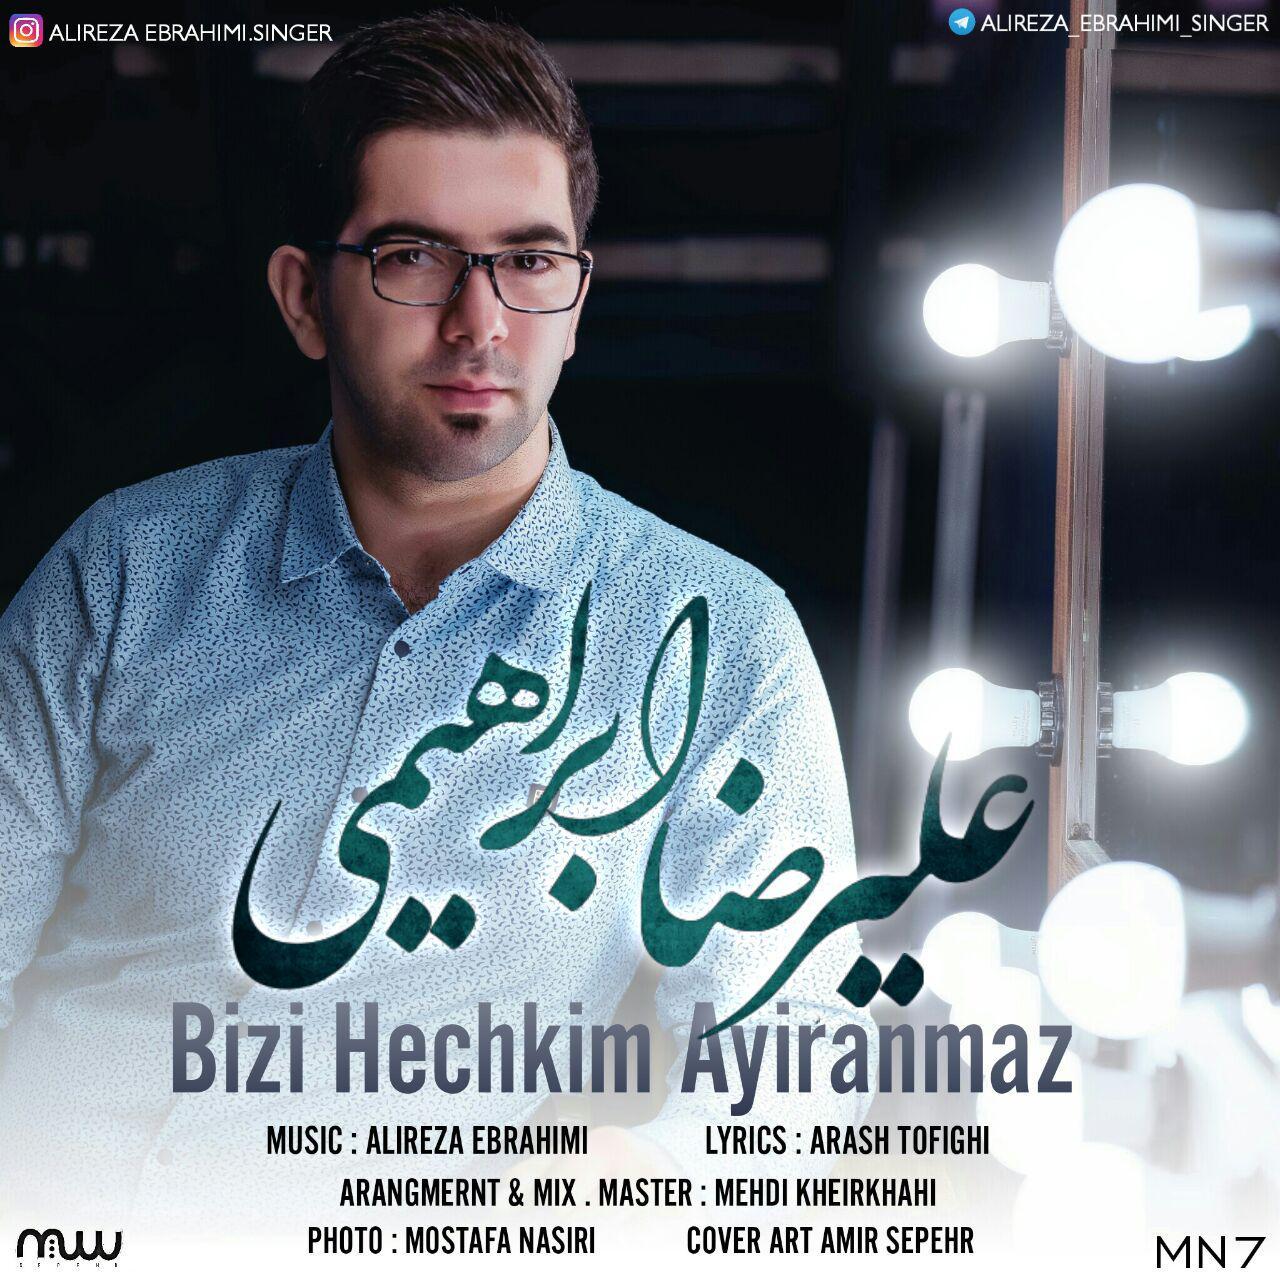 http://s9.picofile.com/file/8310690468/07Alireza_Ebrahimi_Bizi_Hechkim_Ayiranmaz.jpg